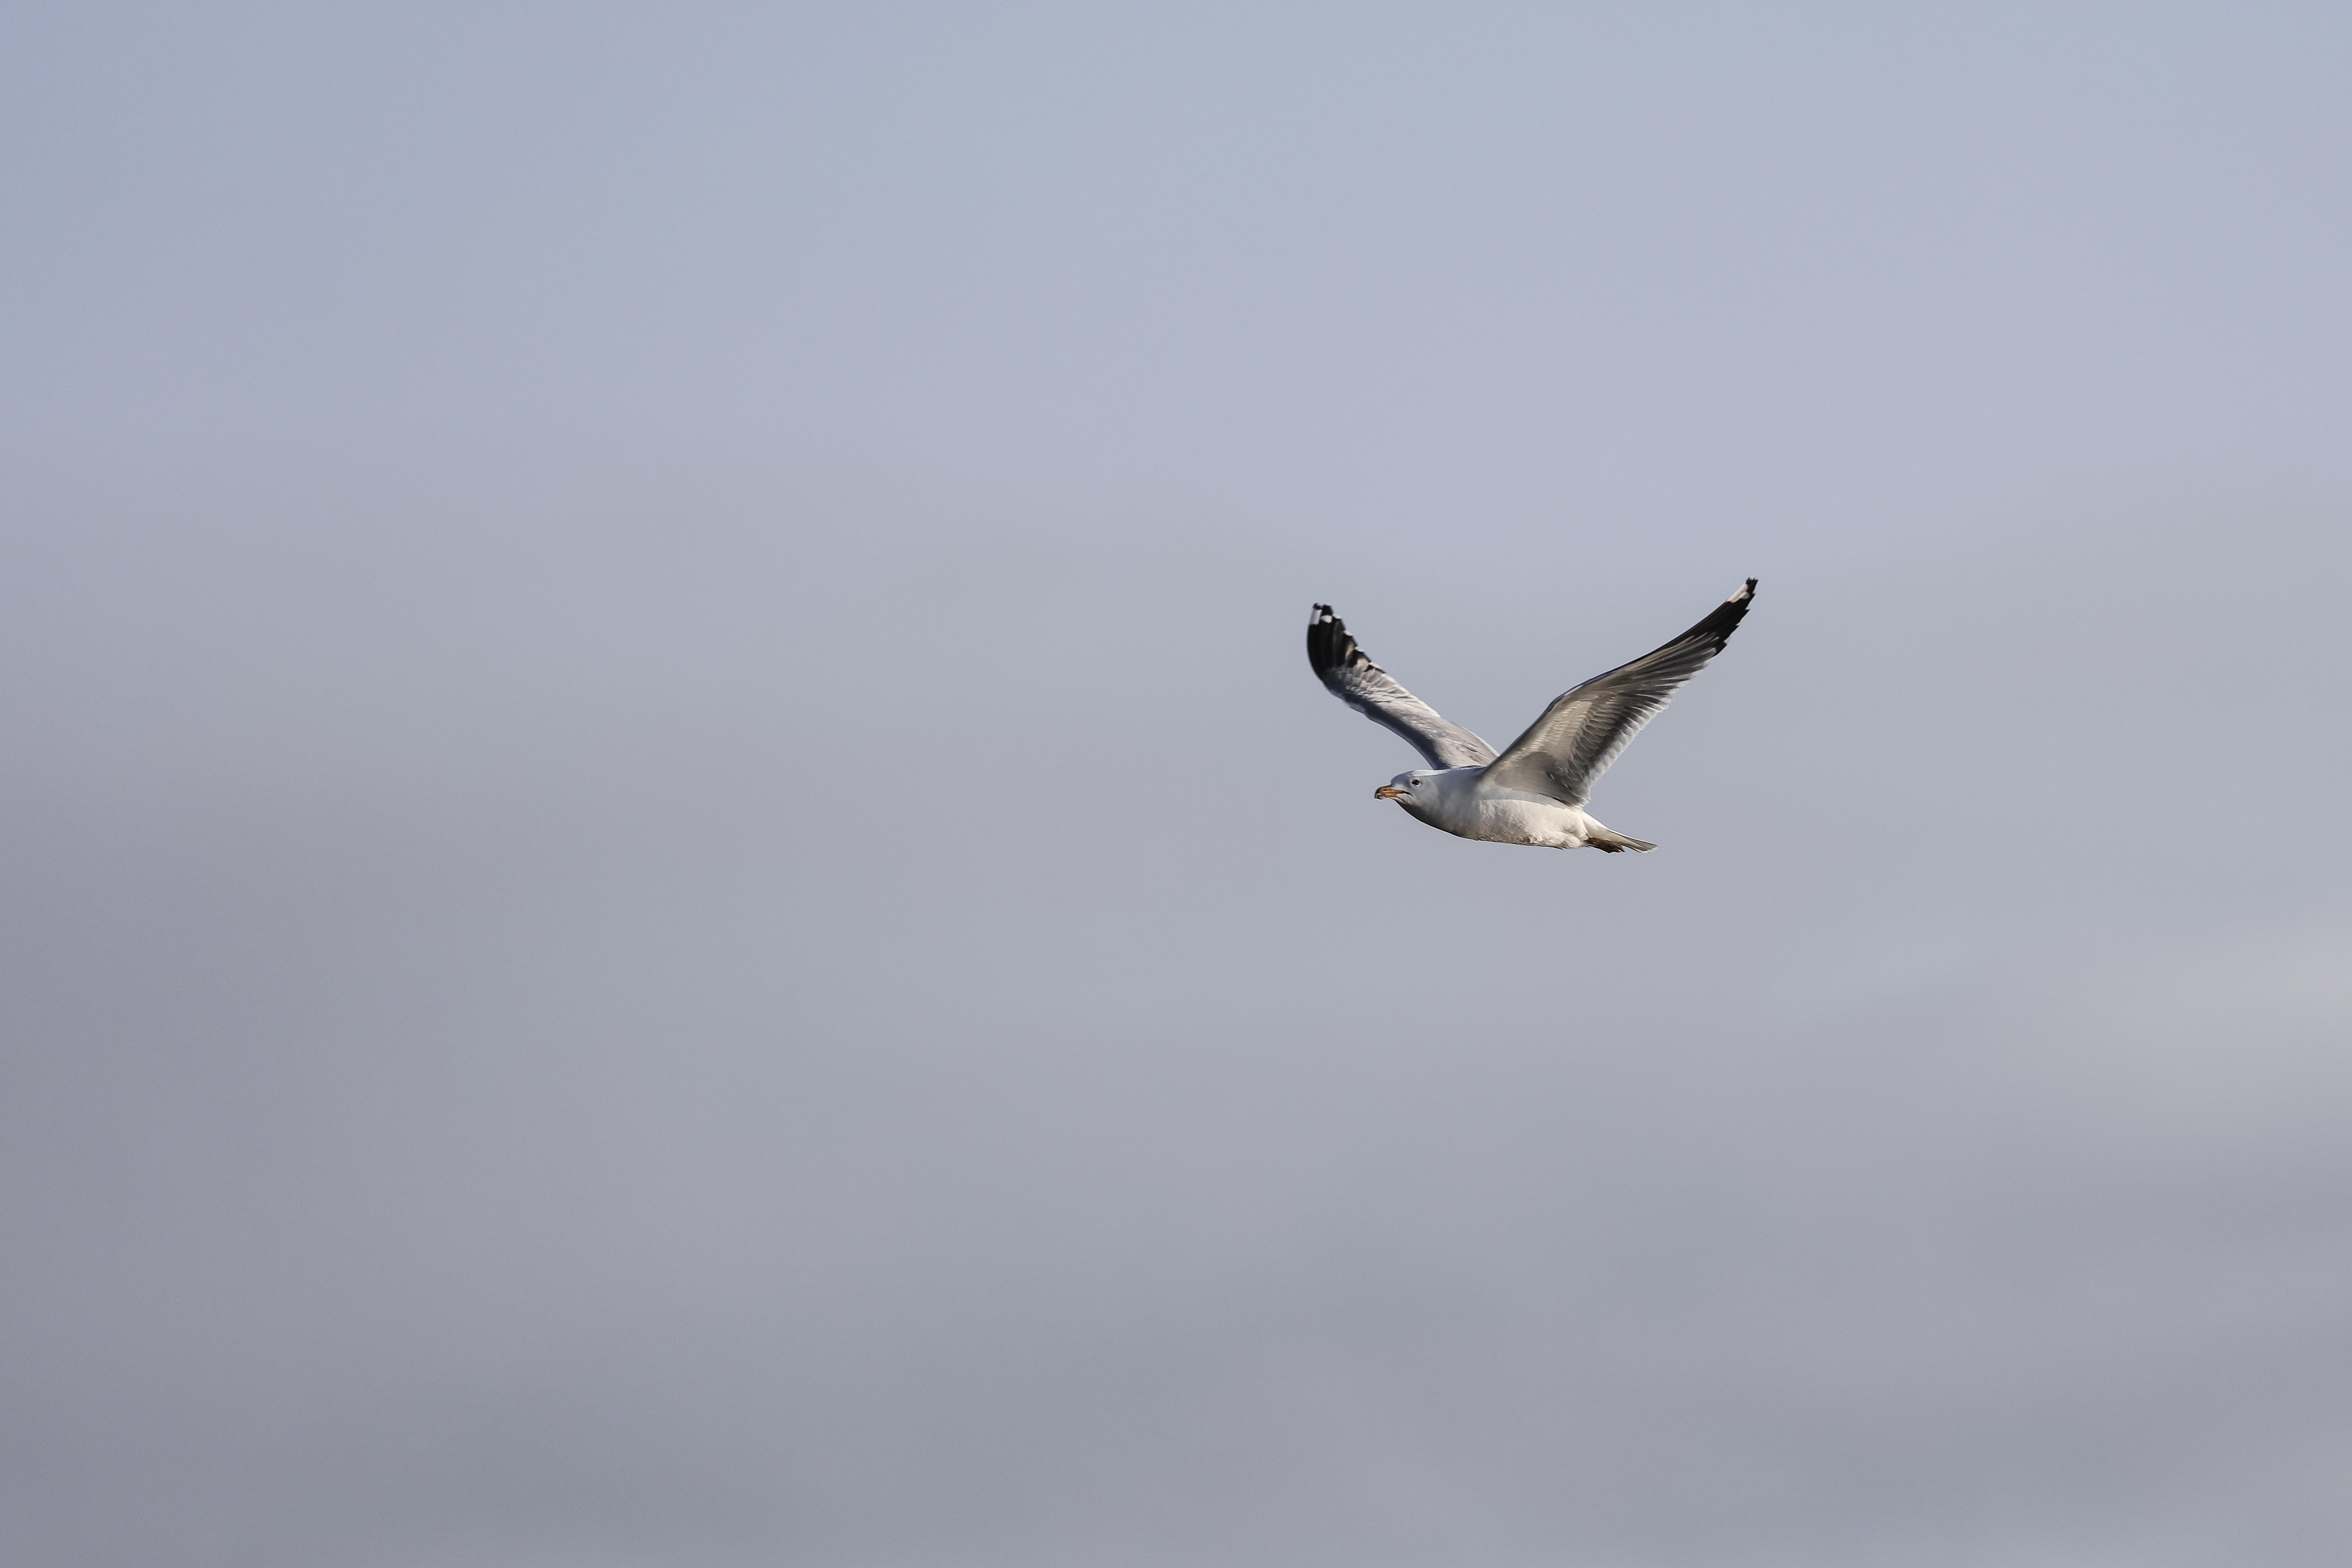 bird flying during daytime